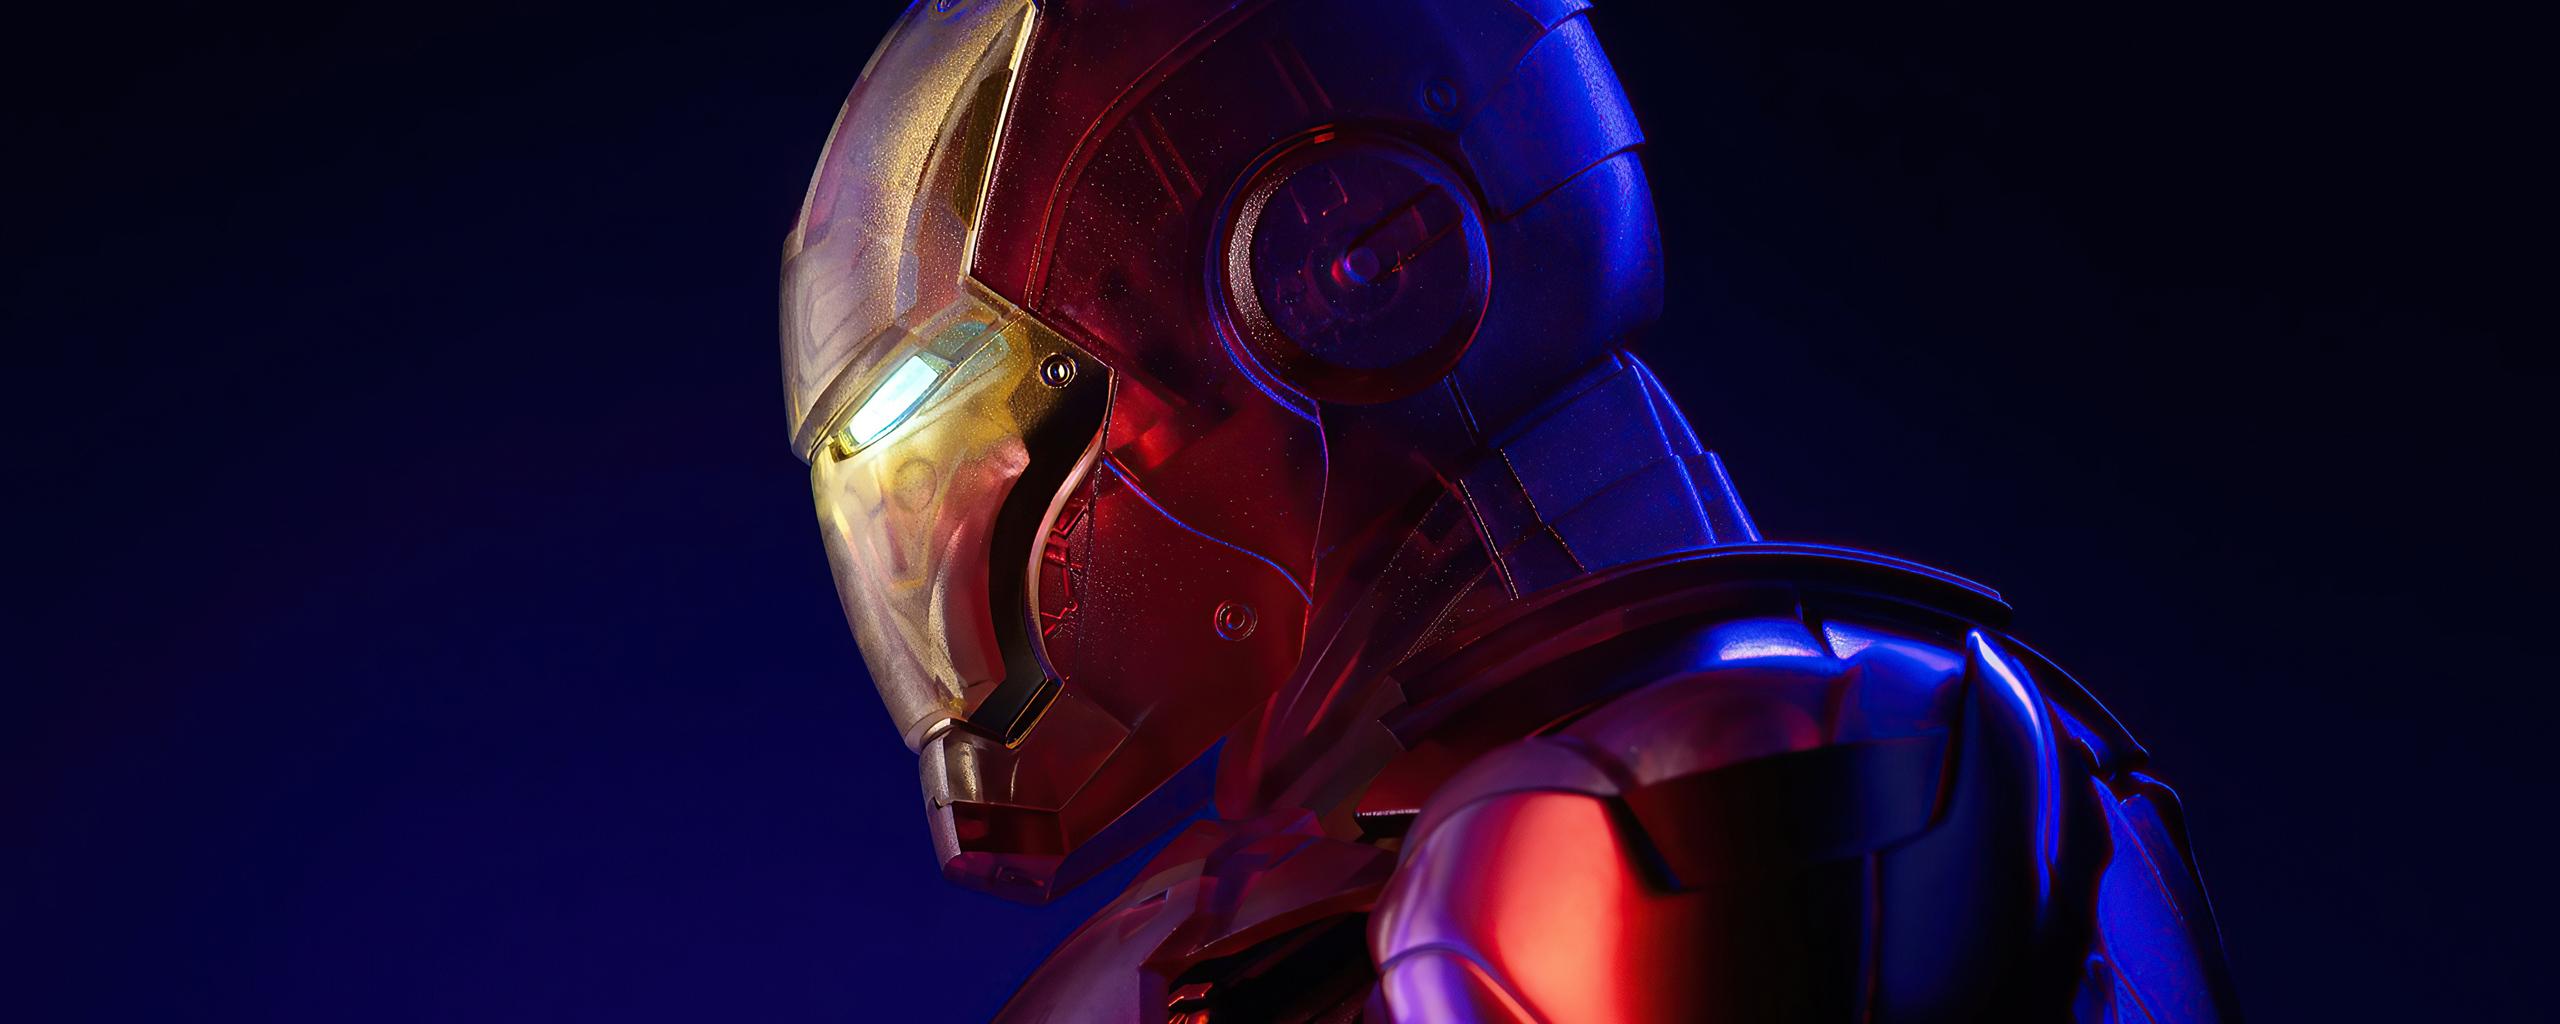 holographic-iron-man-4k-2020-6l.jpg